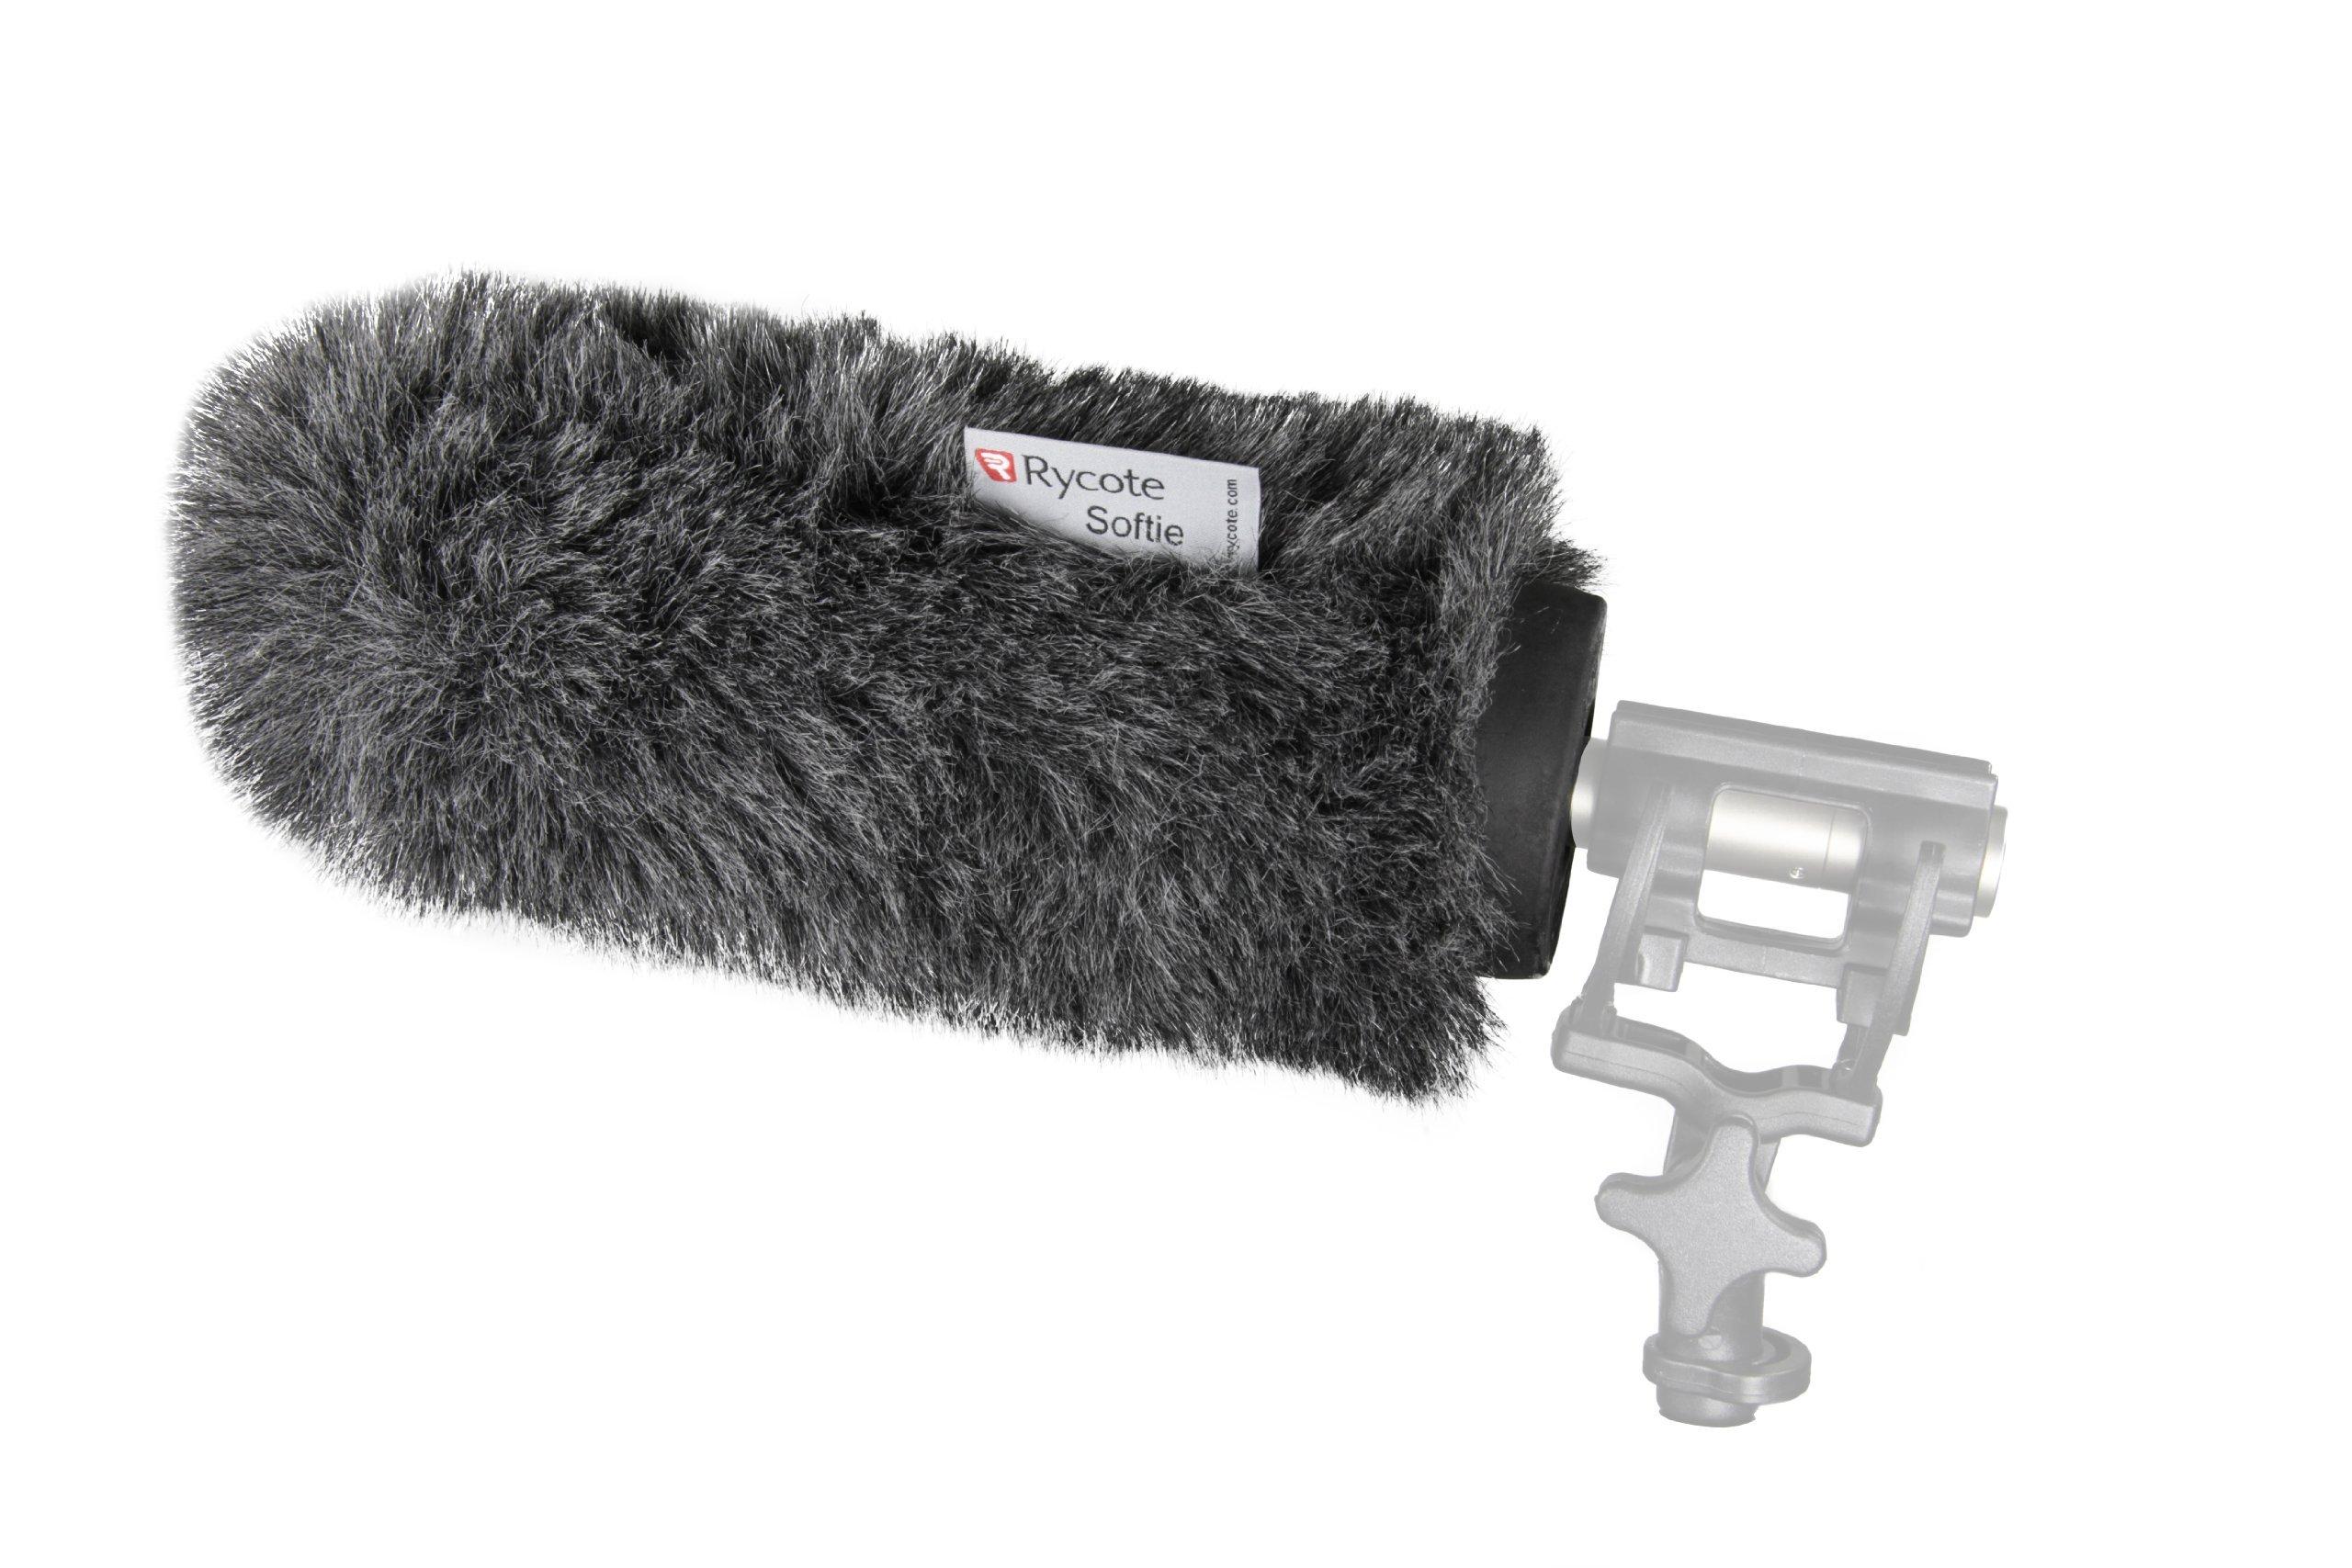 Rycote 33052 Classic-Softie (19/22) Shotgun Microphone Windshield by Rycote